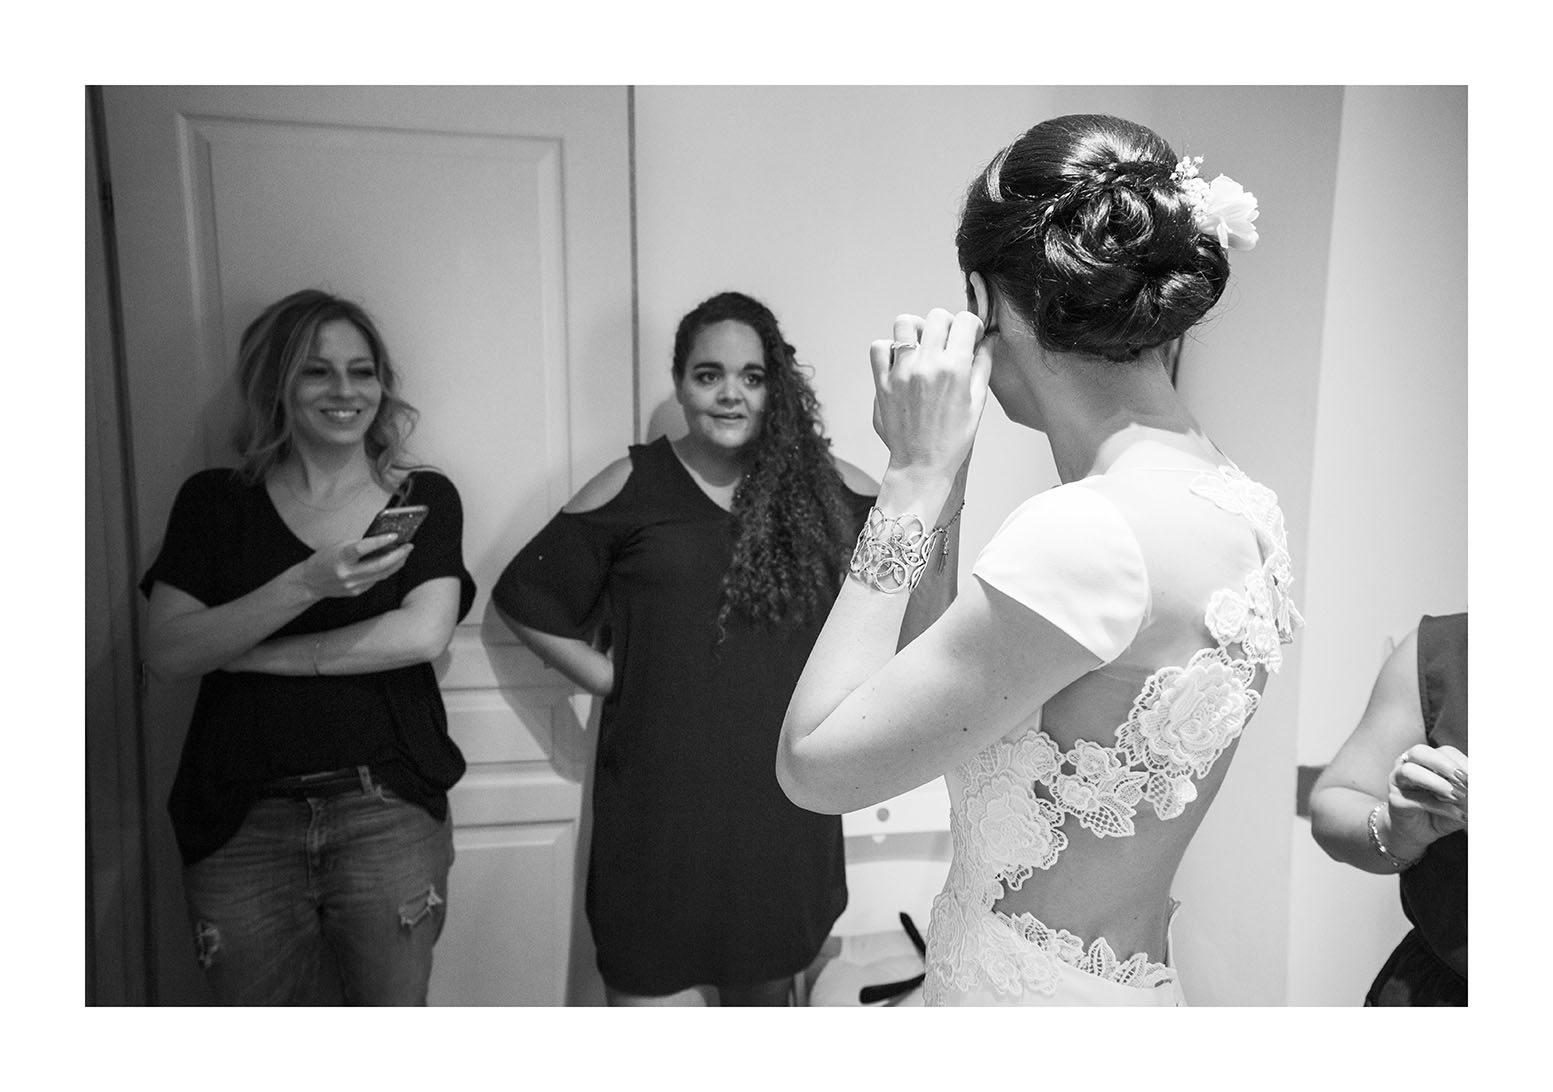 Photographe Morgane Boem Mariage Evenements Narbonne Robe